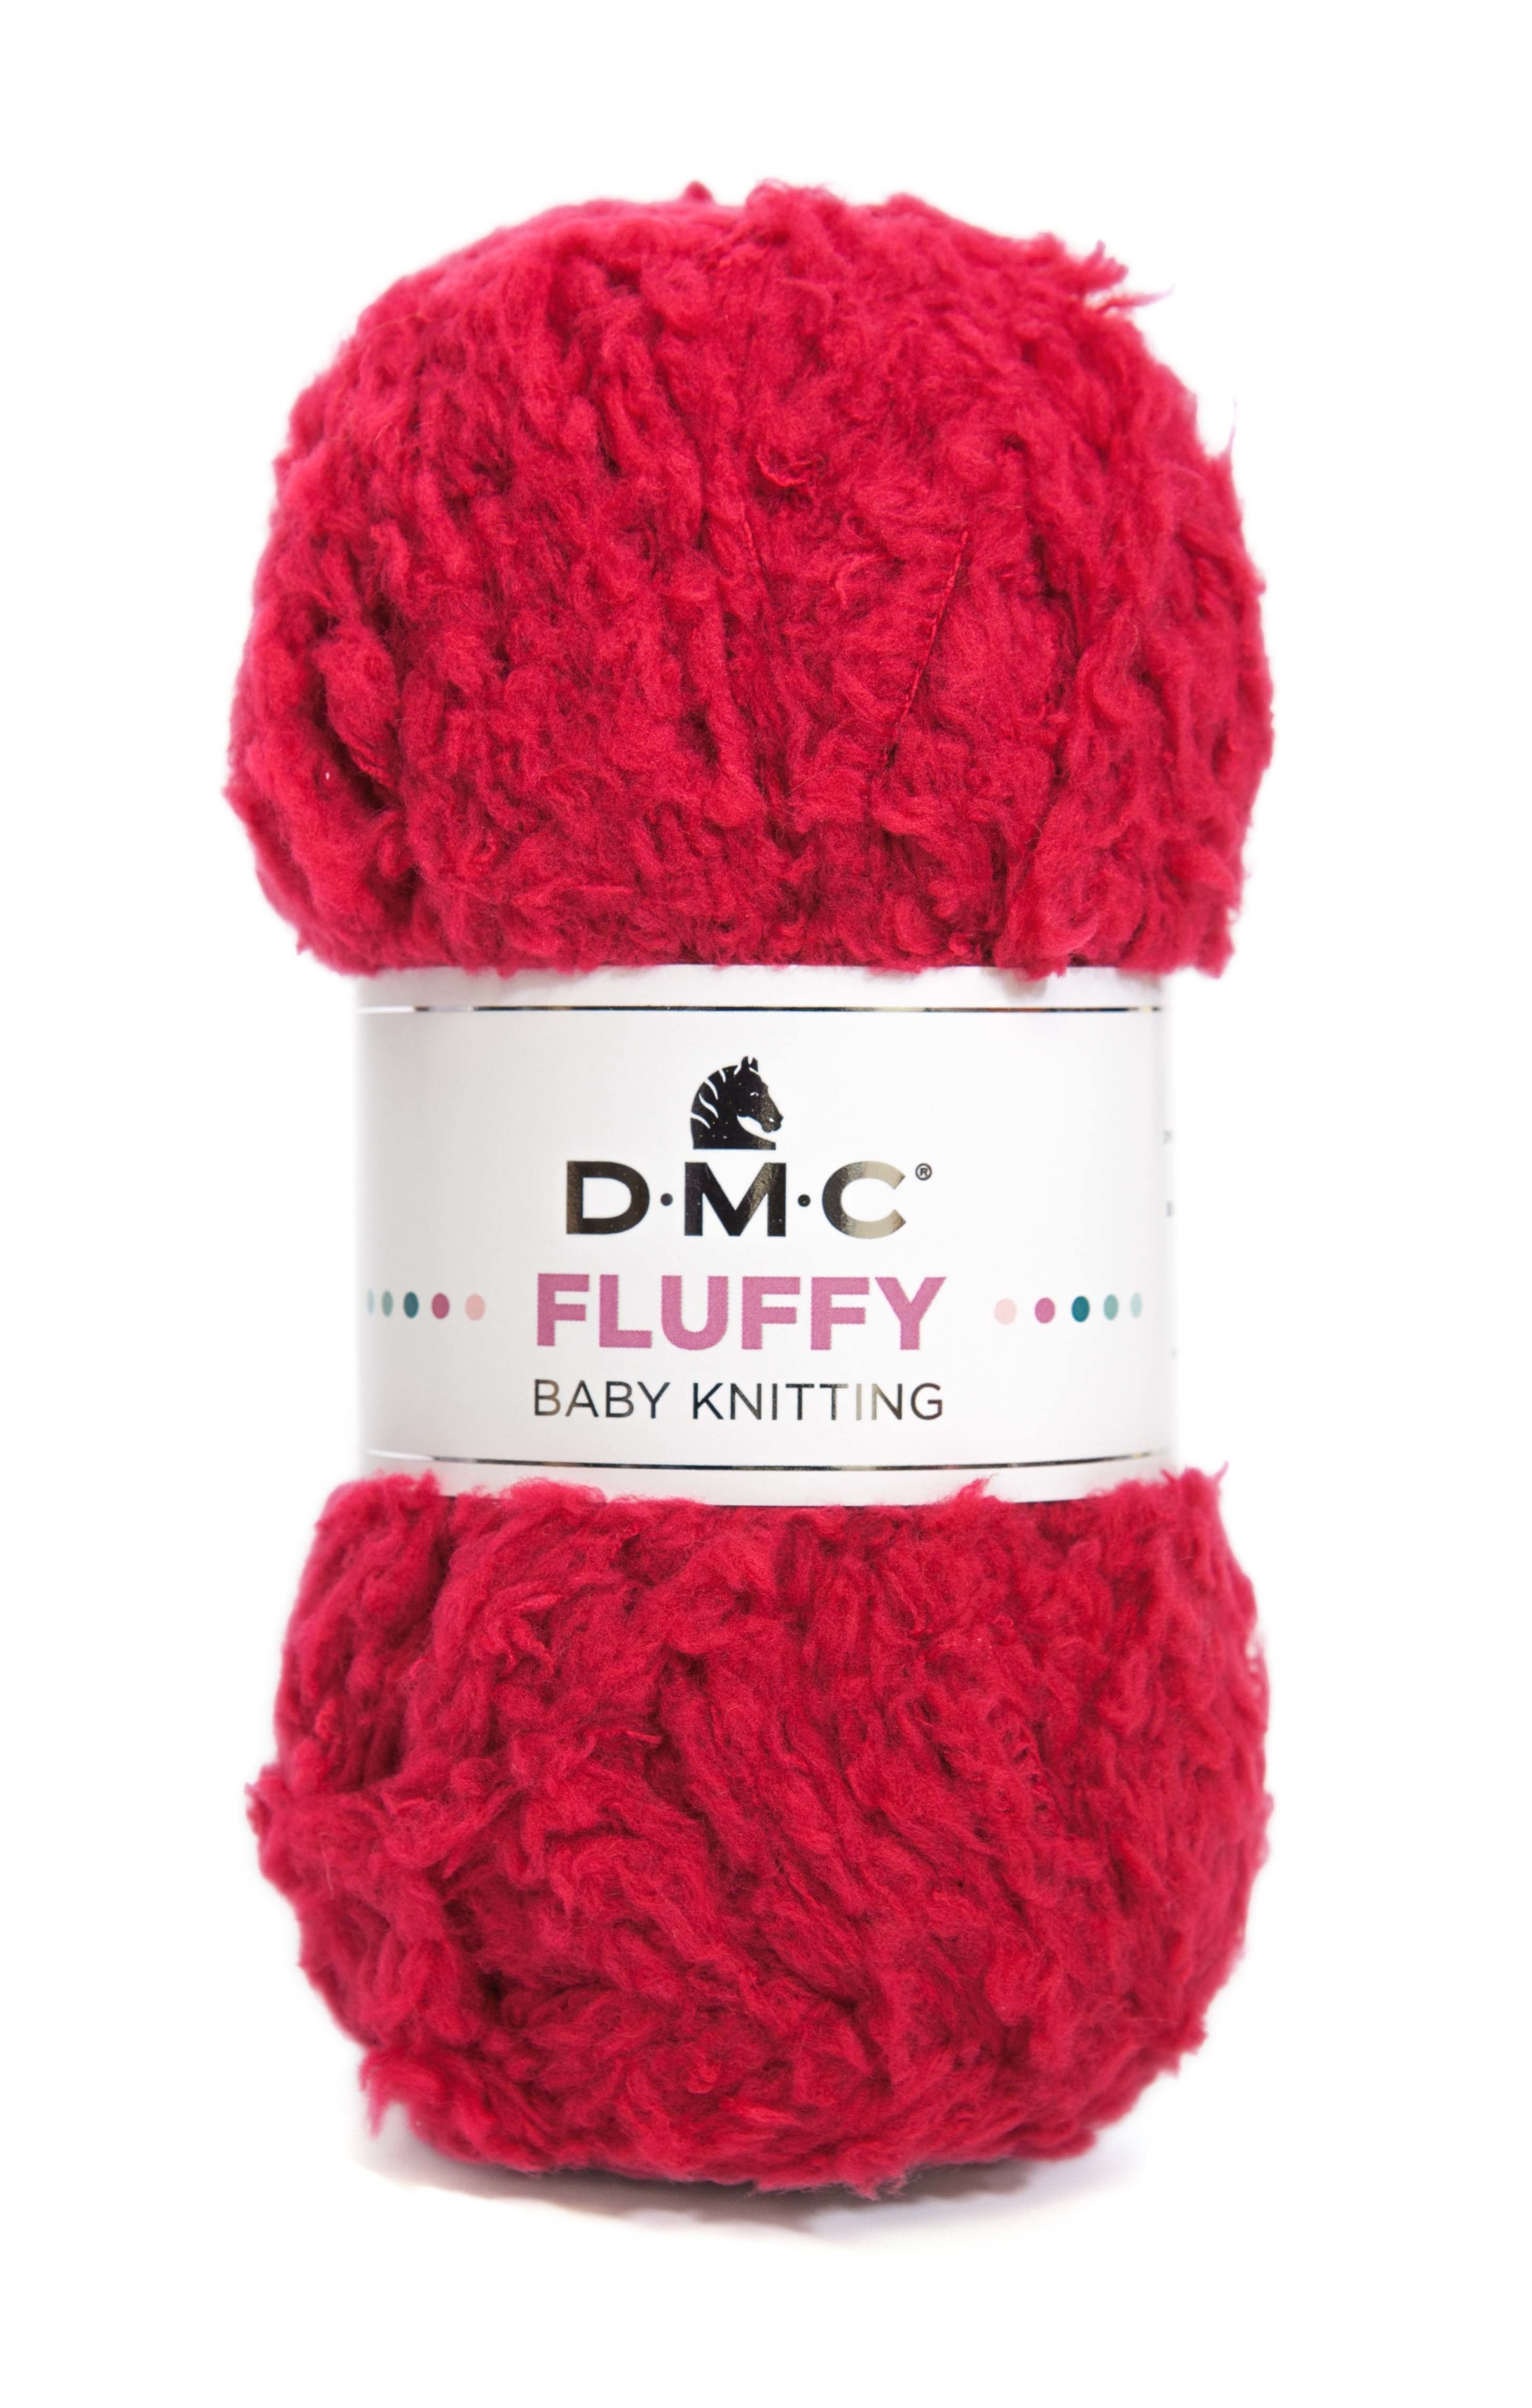 DMC Fluffy 655